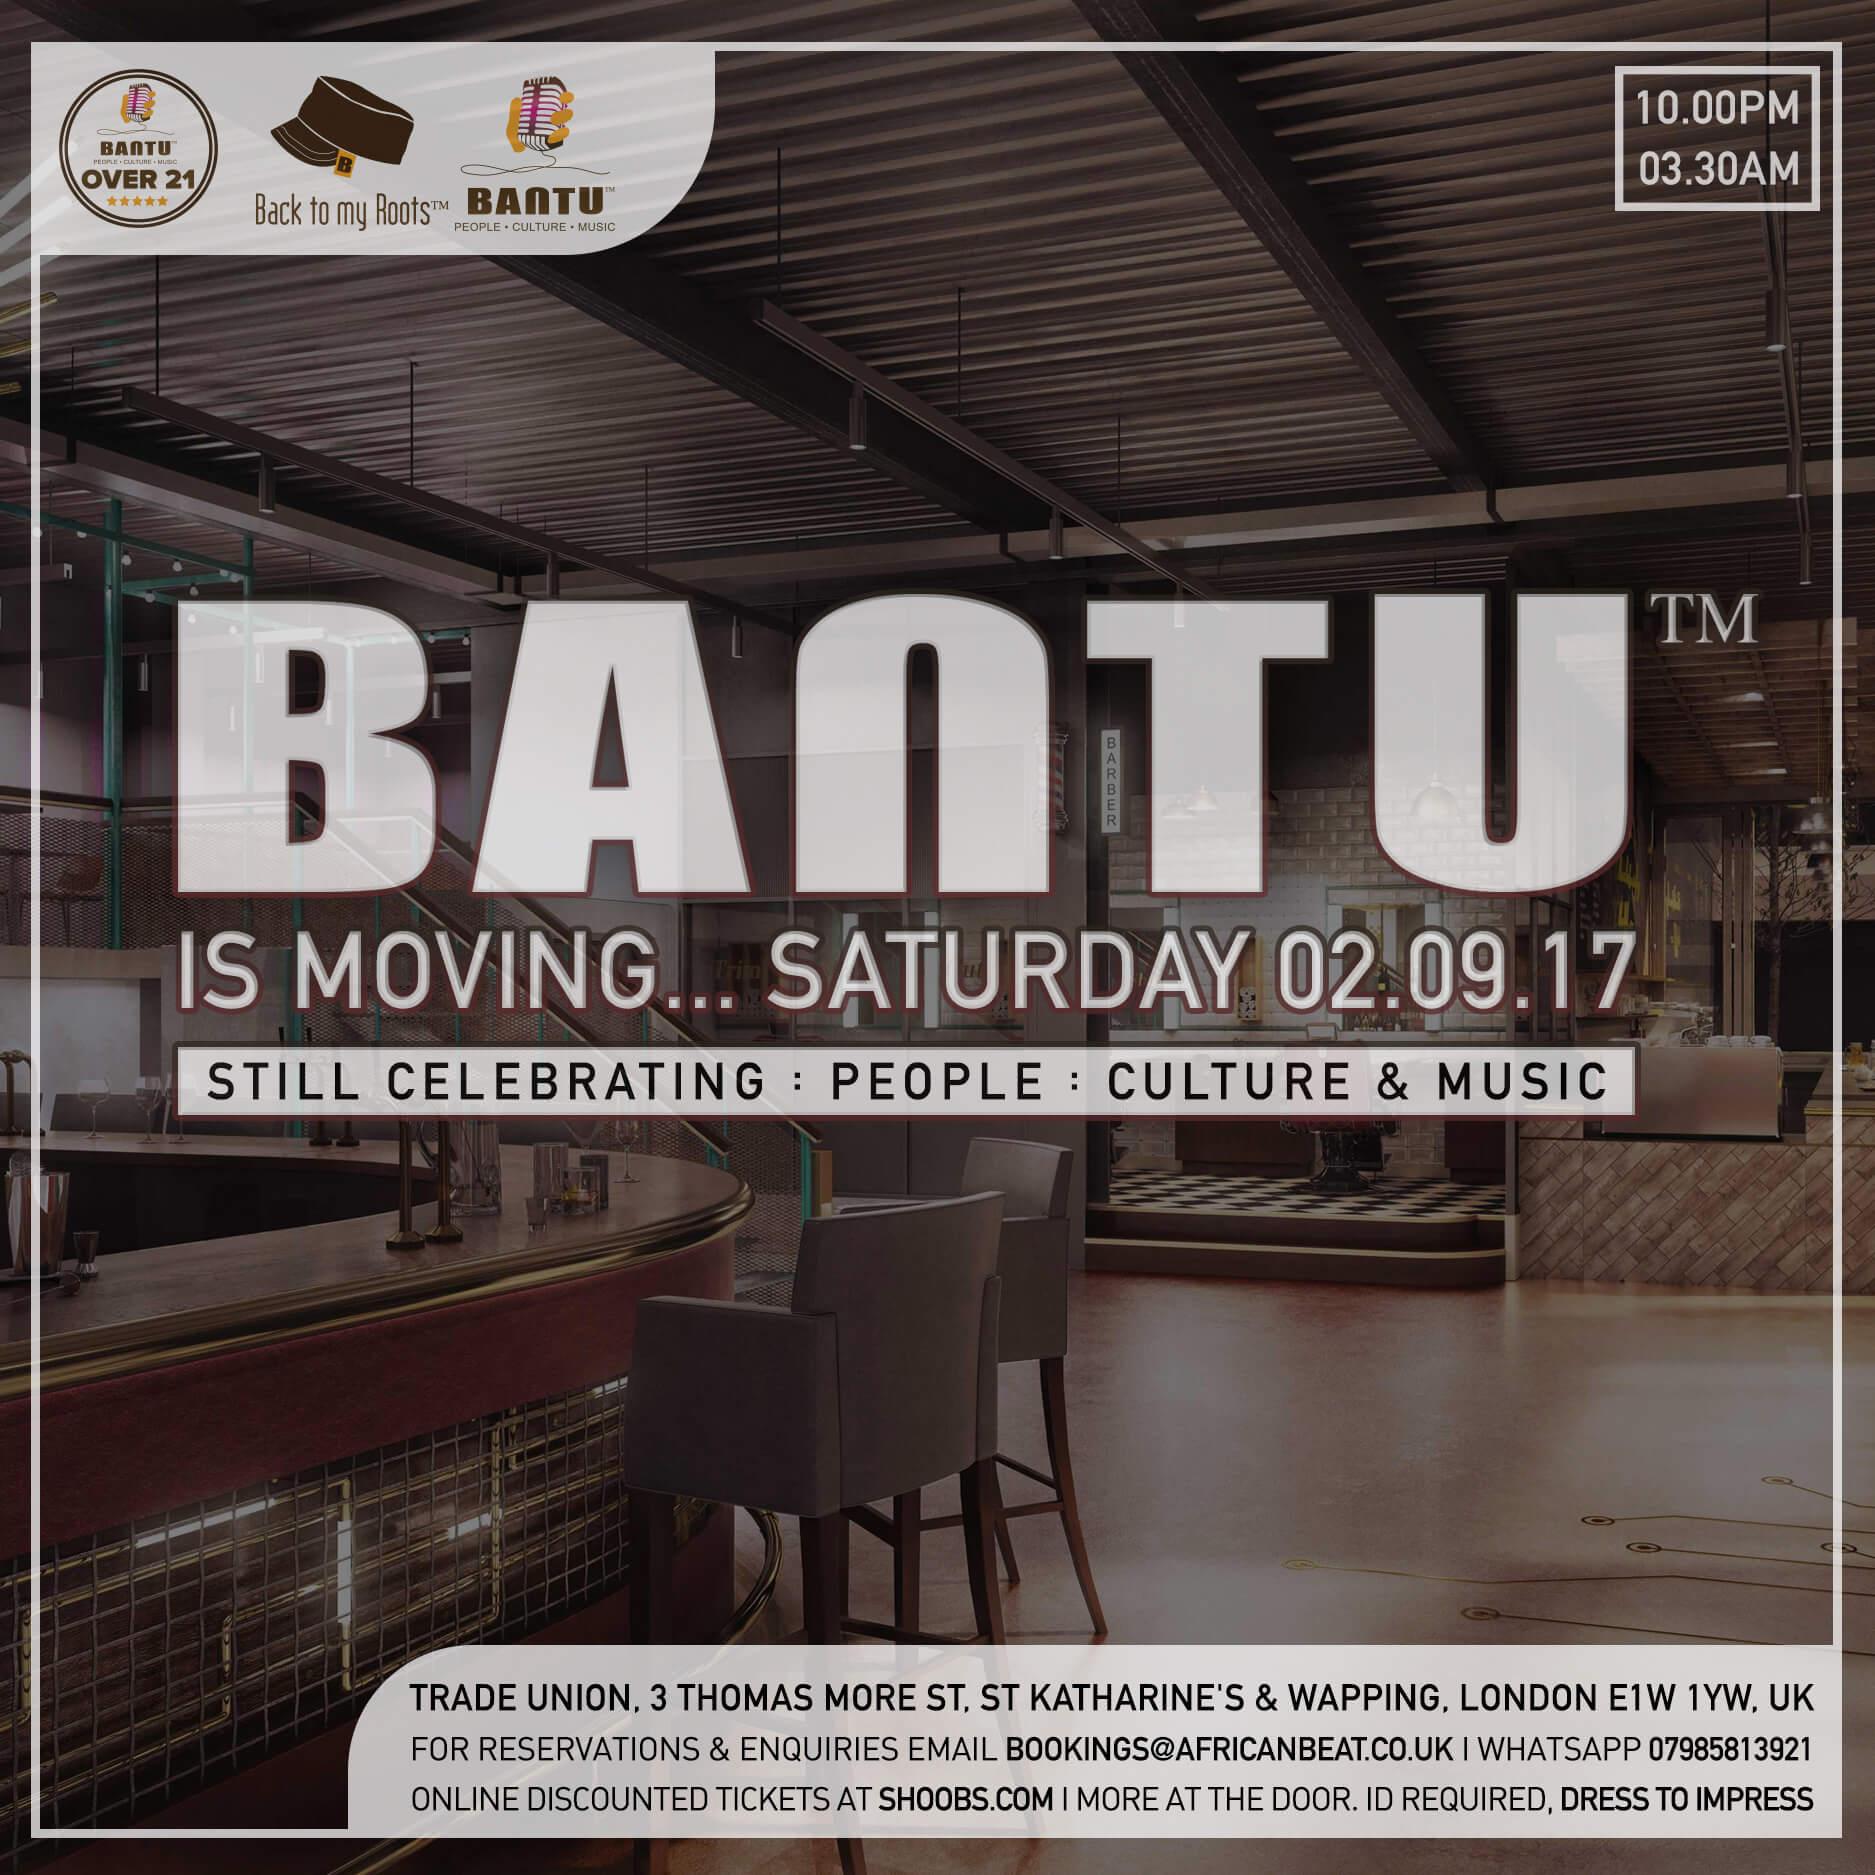 BANTU on Sat 02 Sept - Trade Union Wapping